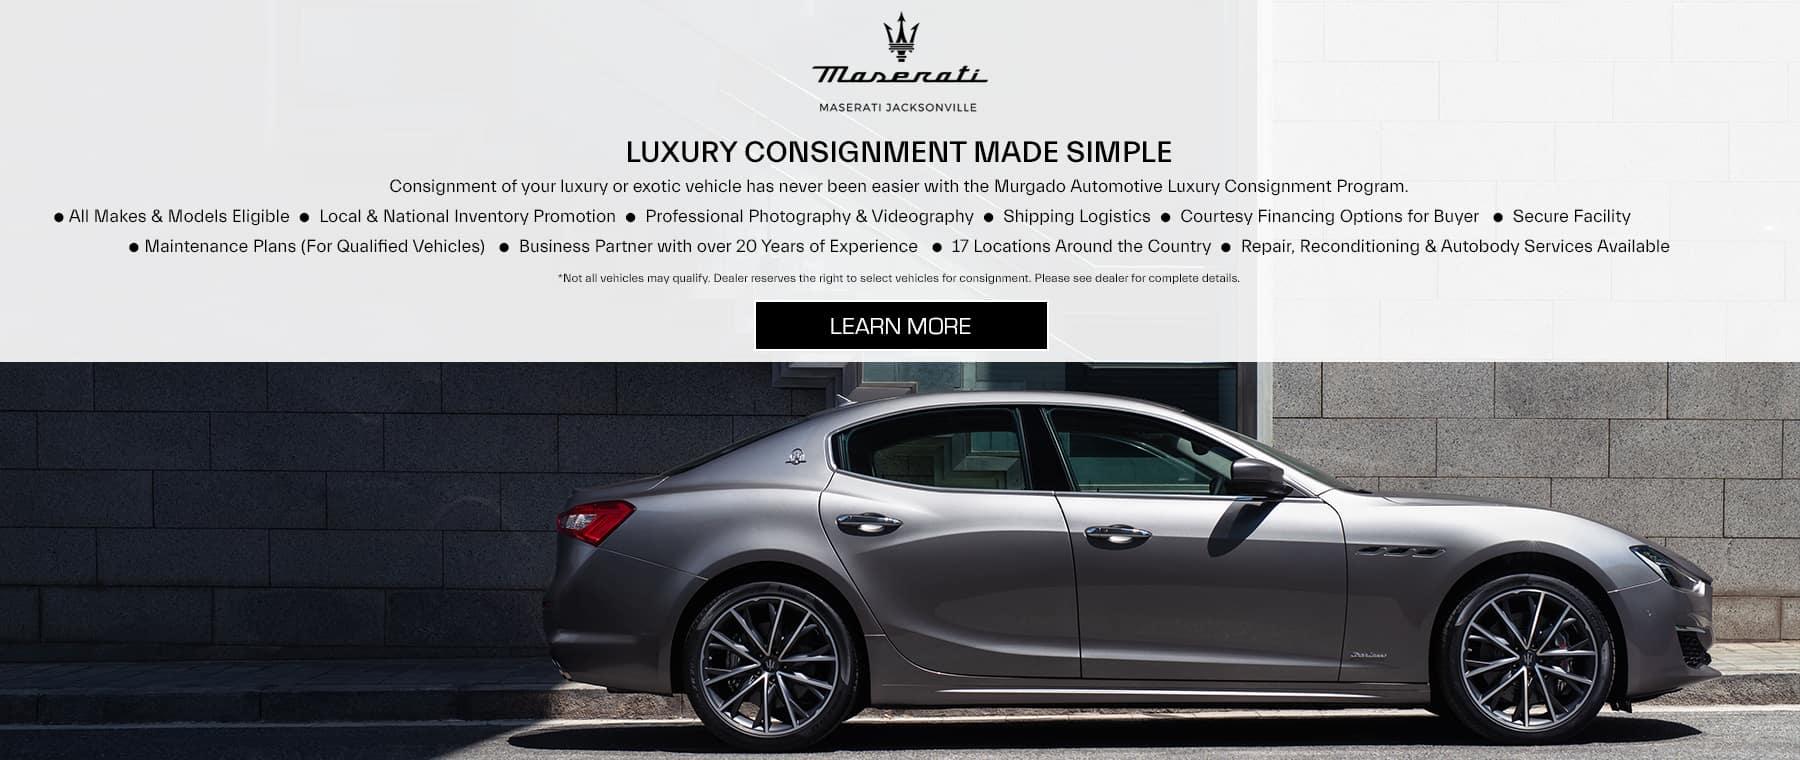 MaseratiRevised-Jacksonville (1)